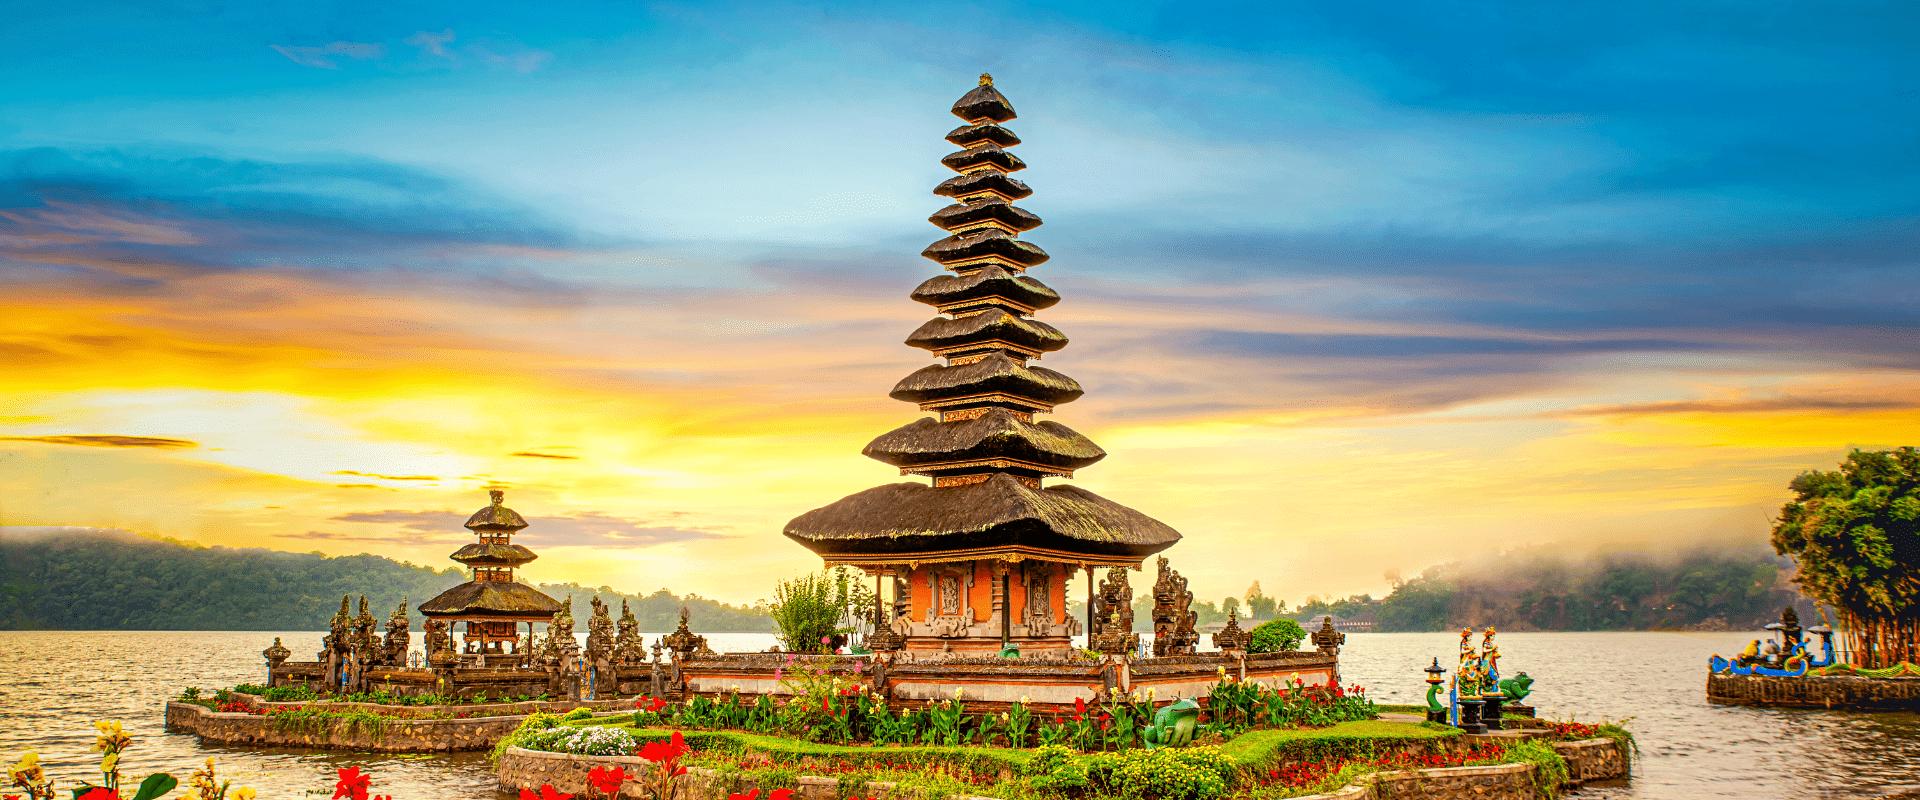 Bali-Lombok Cultural Quality Tour